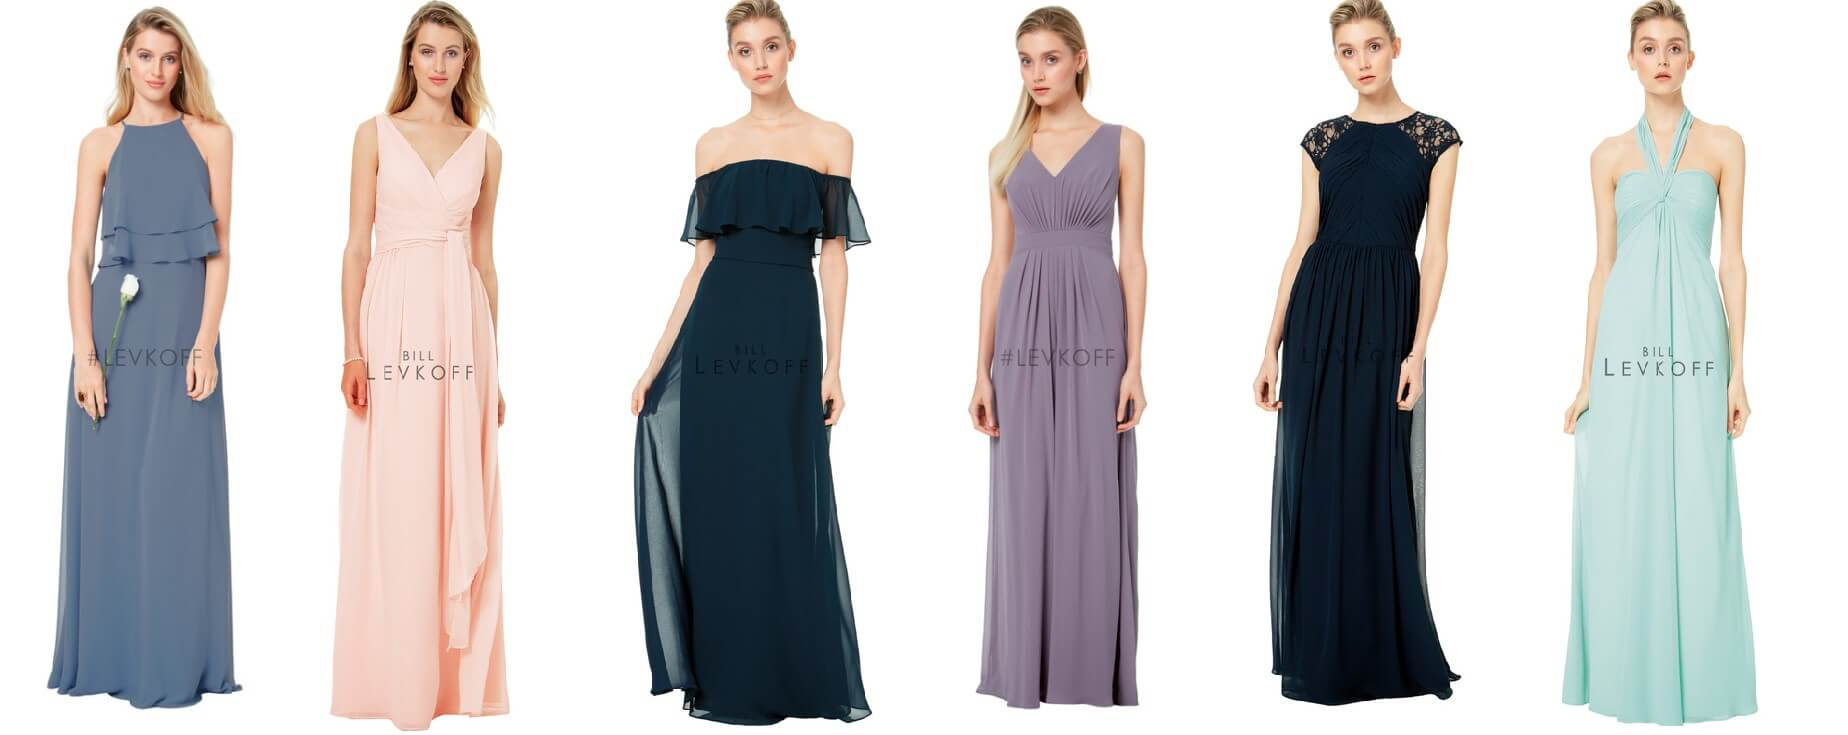 Washington dc bridal stores washington dc bridesmaid dresses m bill levkoff ombrellifo Choice Image